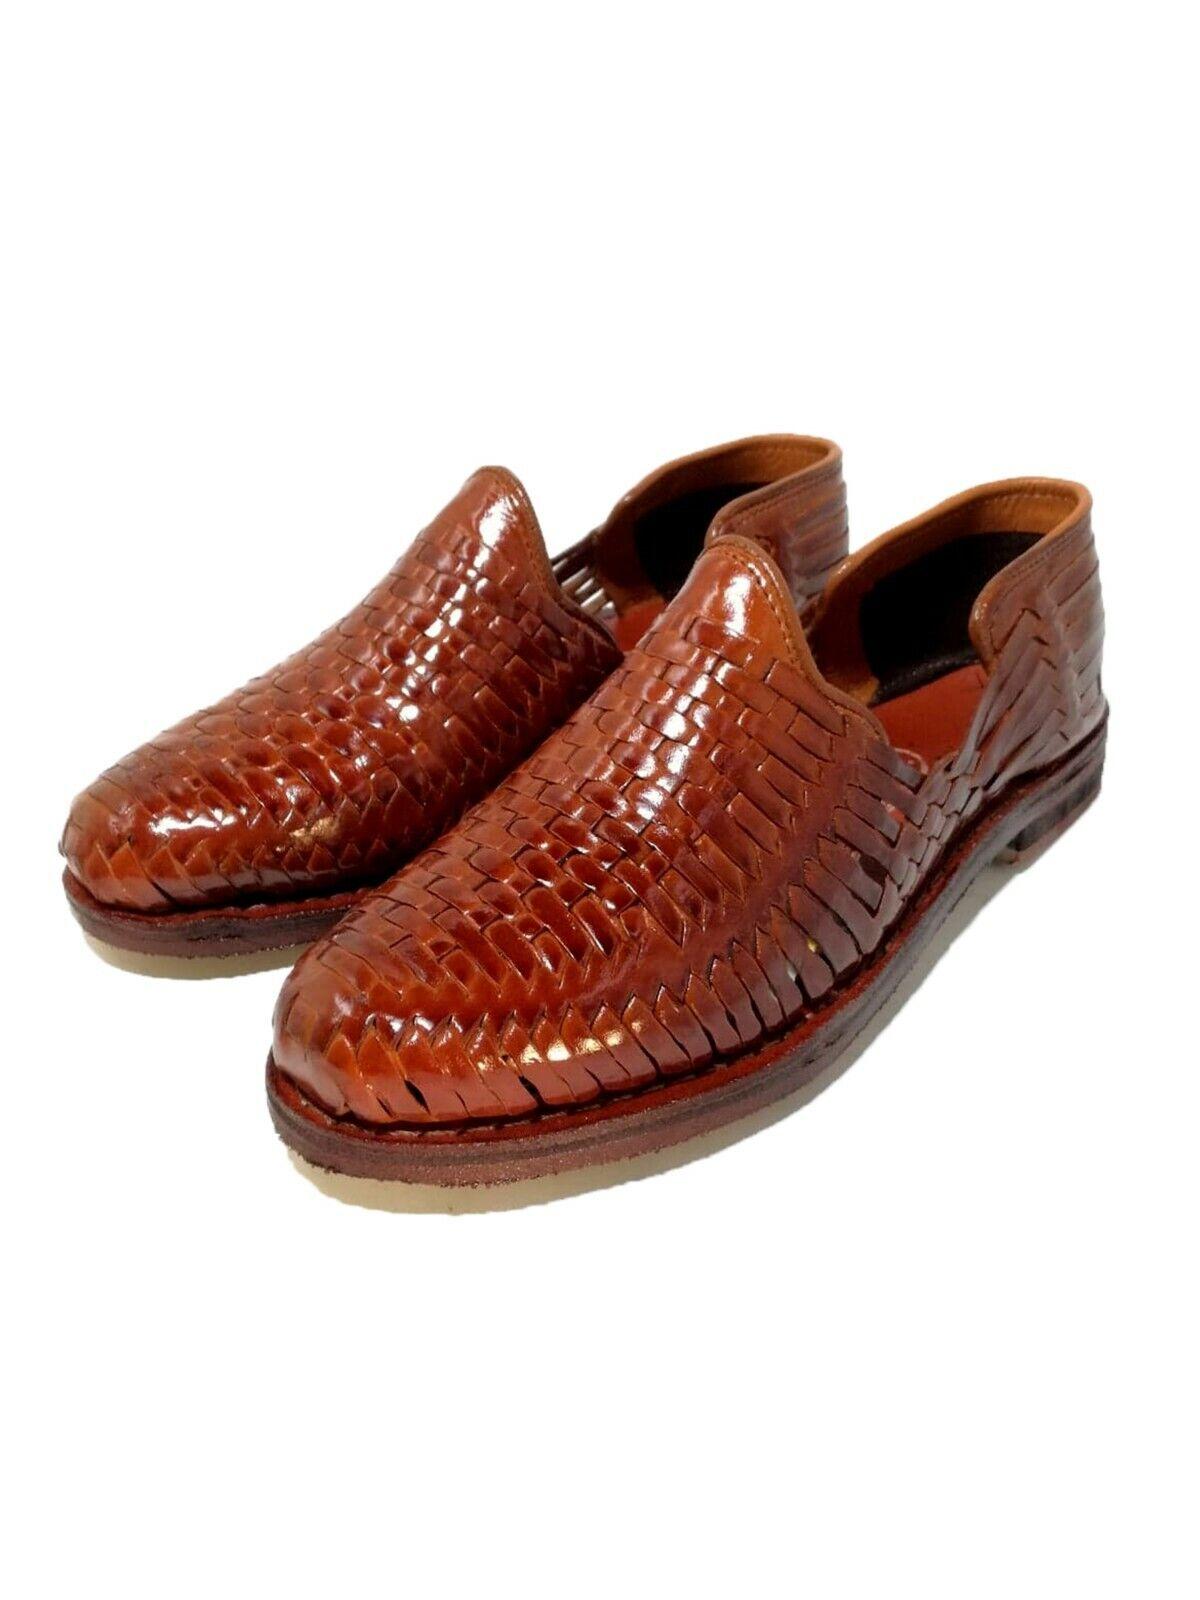 Mens Huaraches sandals mexican. 100% leather, vintage. Handmade. huarache